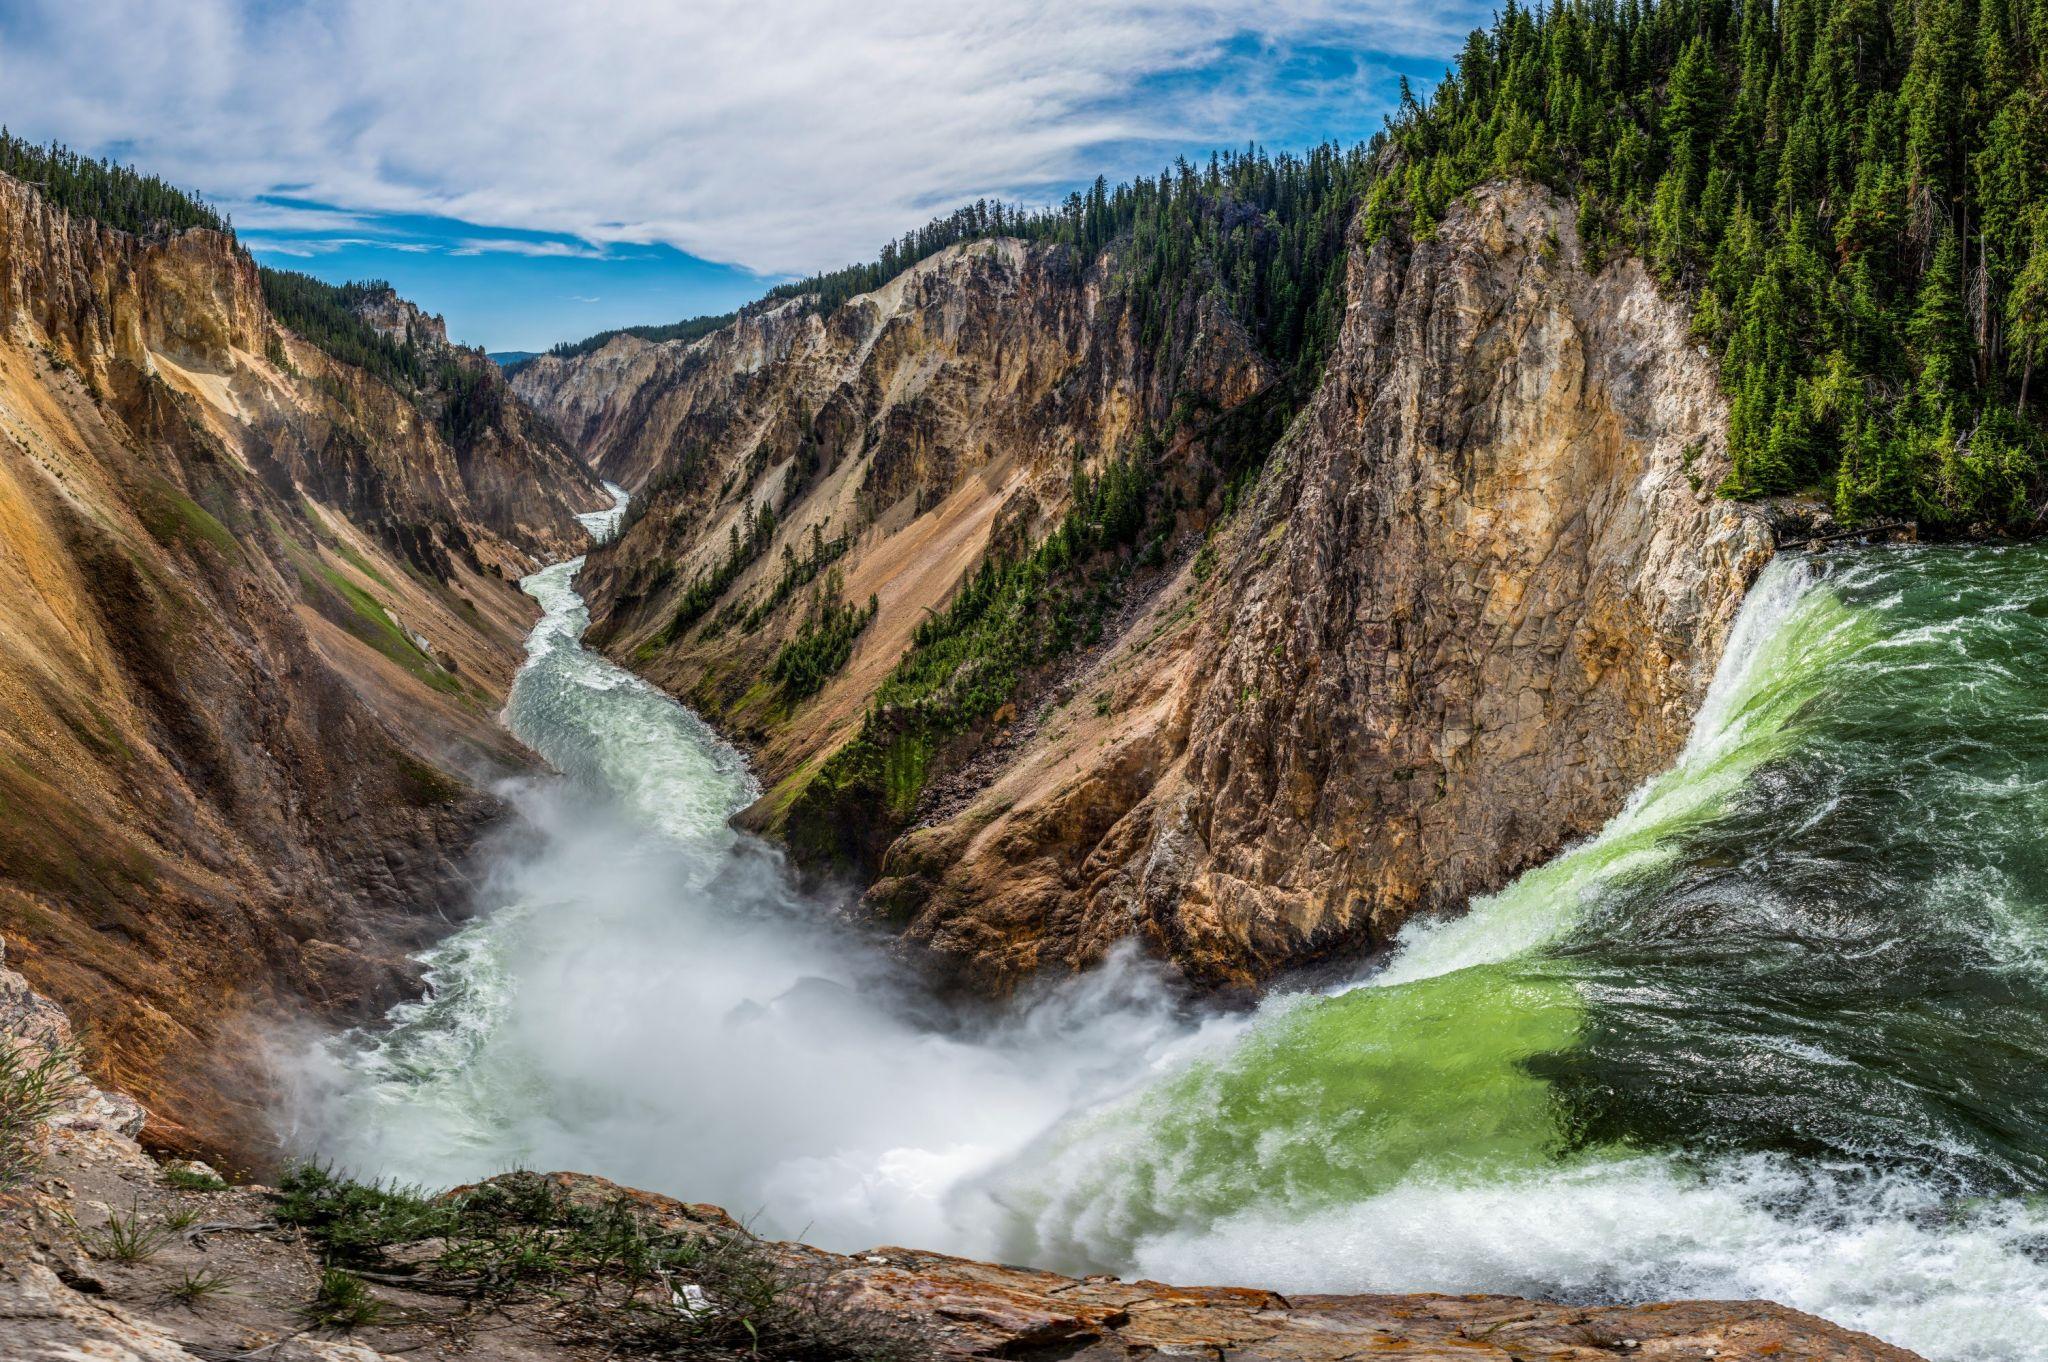 Brink of Lower Falls, USA